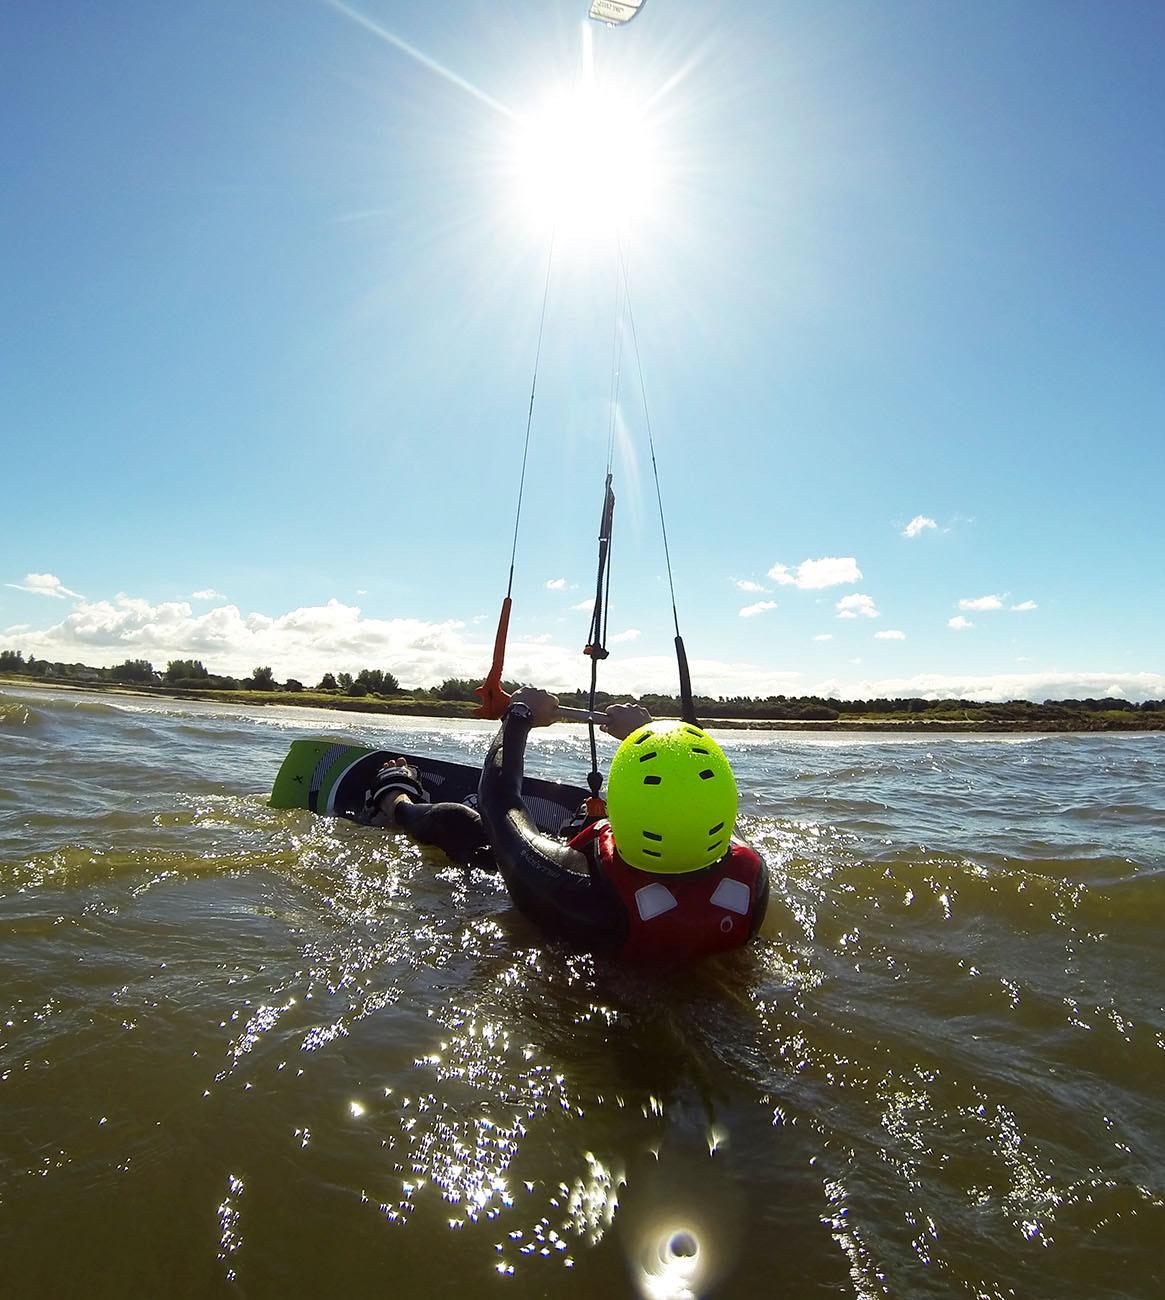 Kitesurfing School Edinburgh Glasgow Fife Kitesurfing Lessons